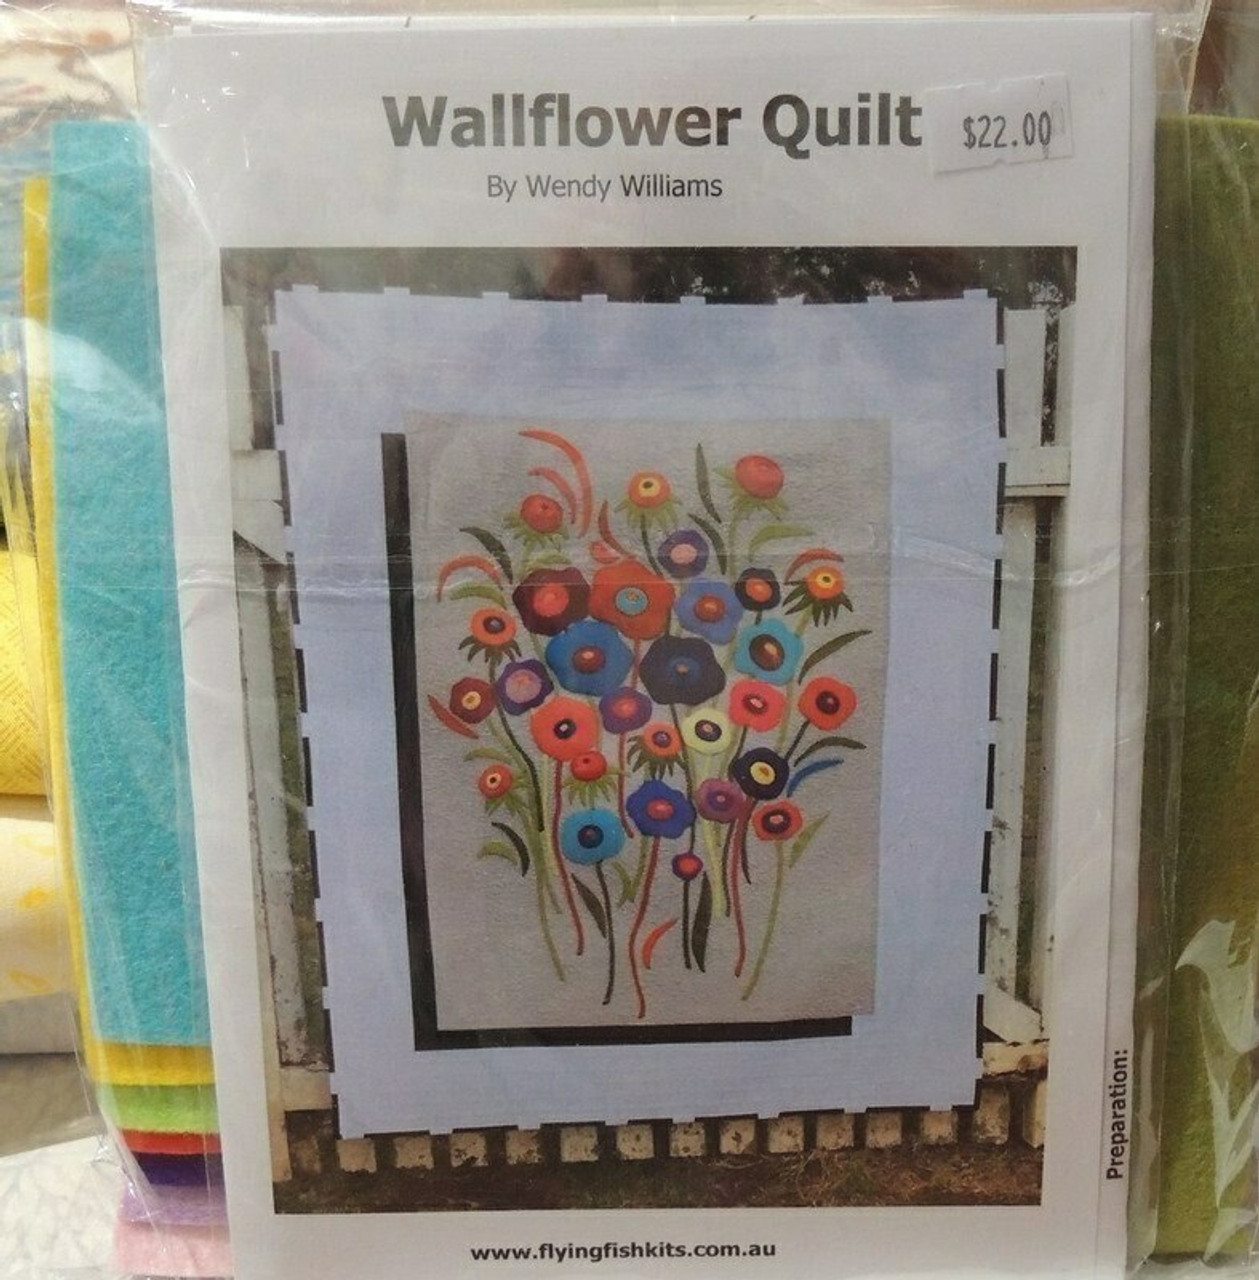 Wendy Williams : Wallflower Quilt - Wool Felt Kit